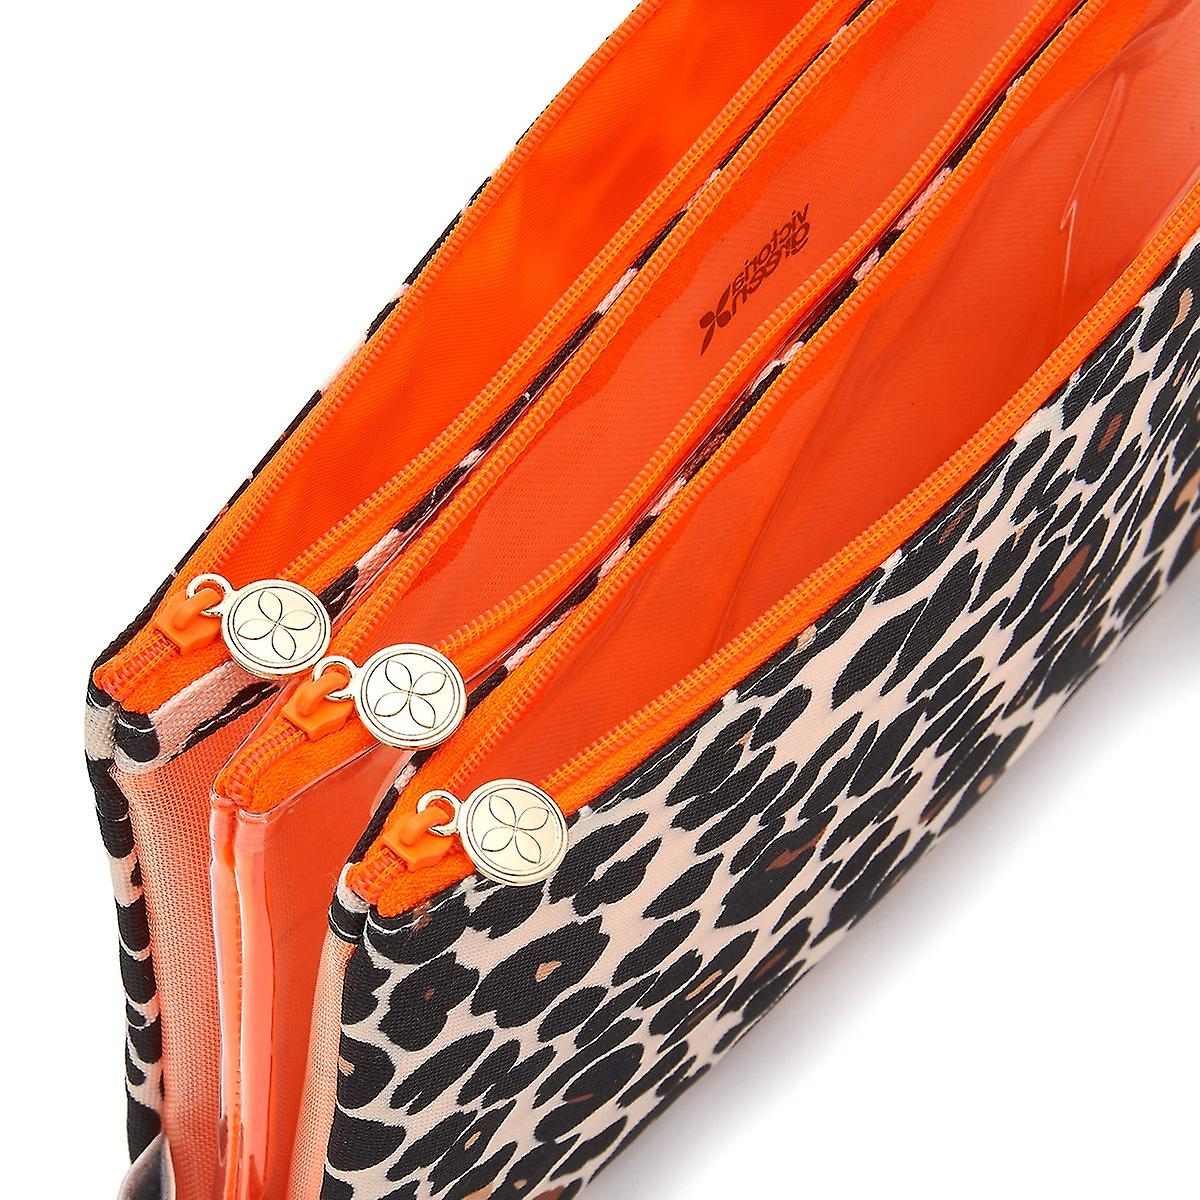 'victoria green' amy 3 in 1 makeup wallet in leopard tan